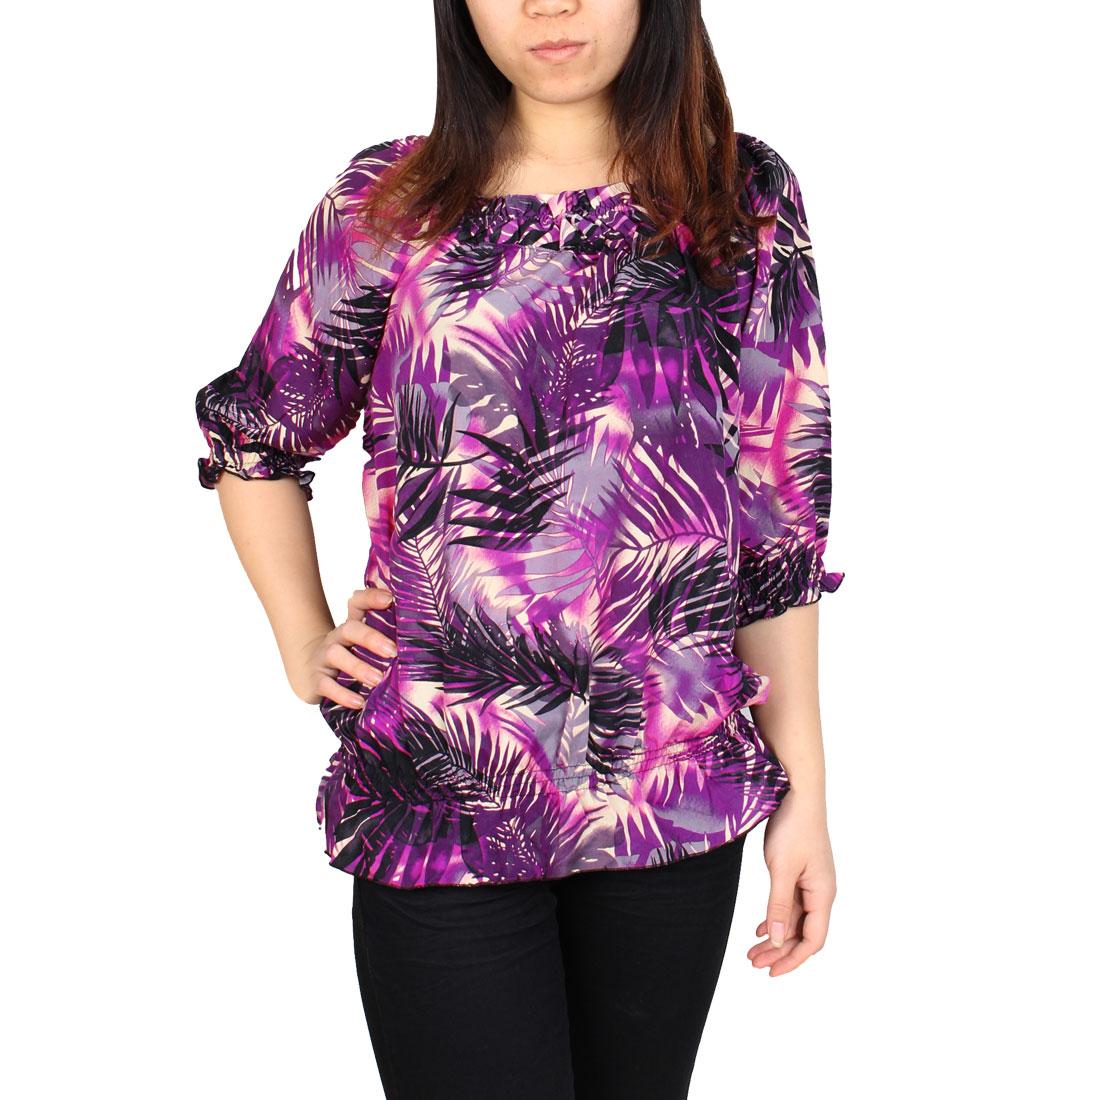 Ladies Leaf Pattern Elastic Waist Short Sleeve Boat Neck Top Blouse Shirt Purple Black M